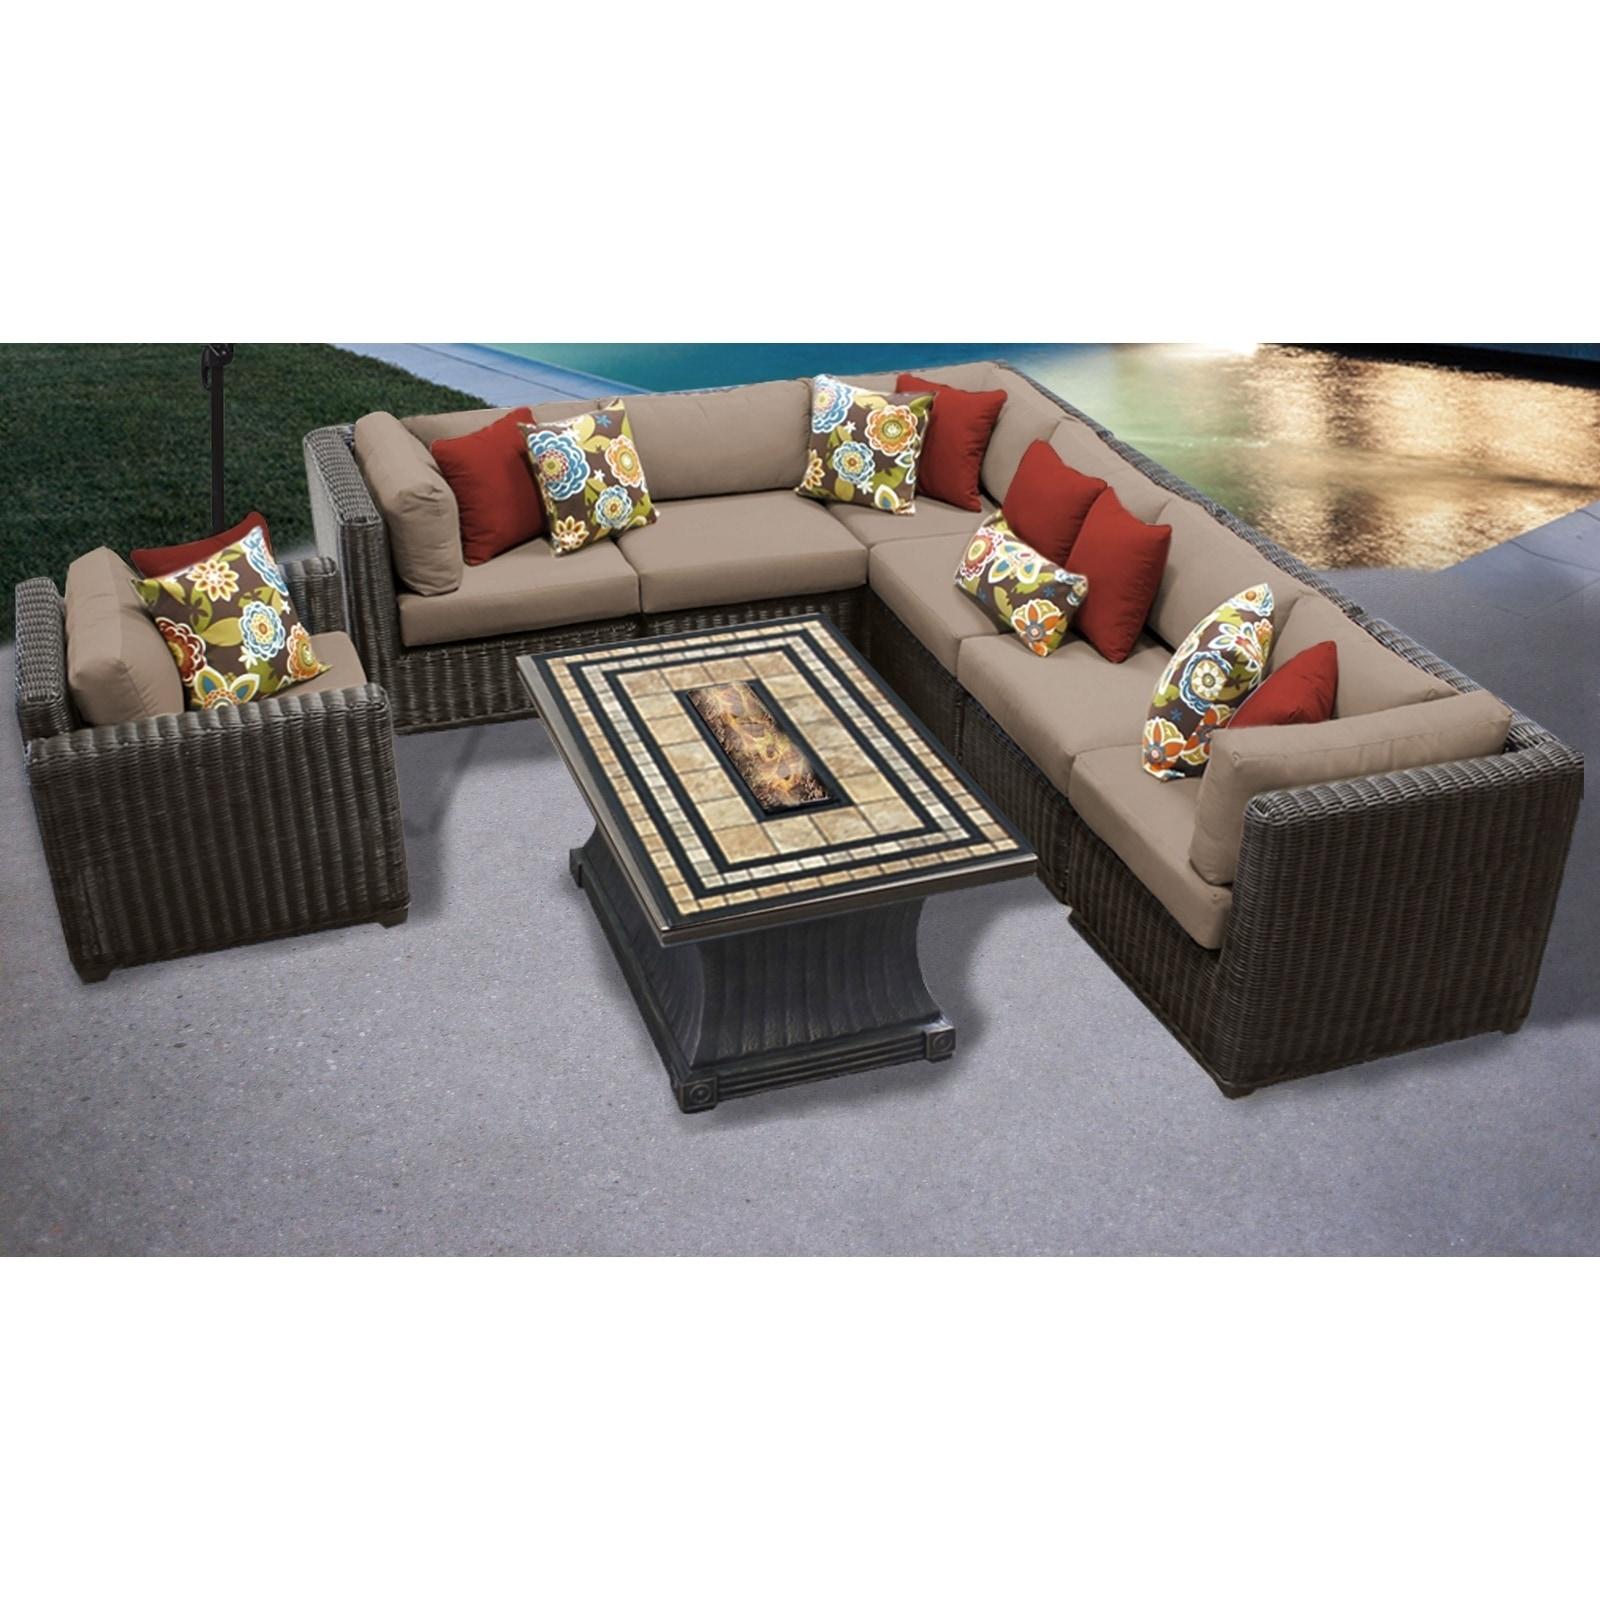 Venice 8 Piece Outdoor Wicker Patio Furniture Set 08e Free Shipping Today 24017917